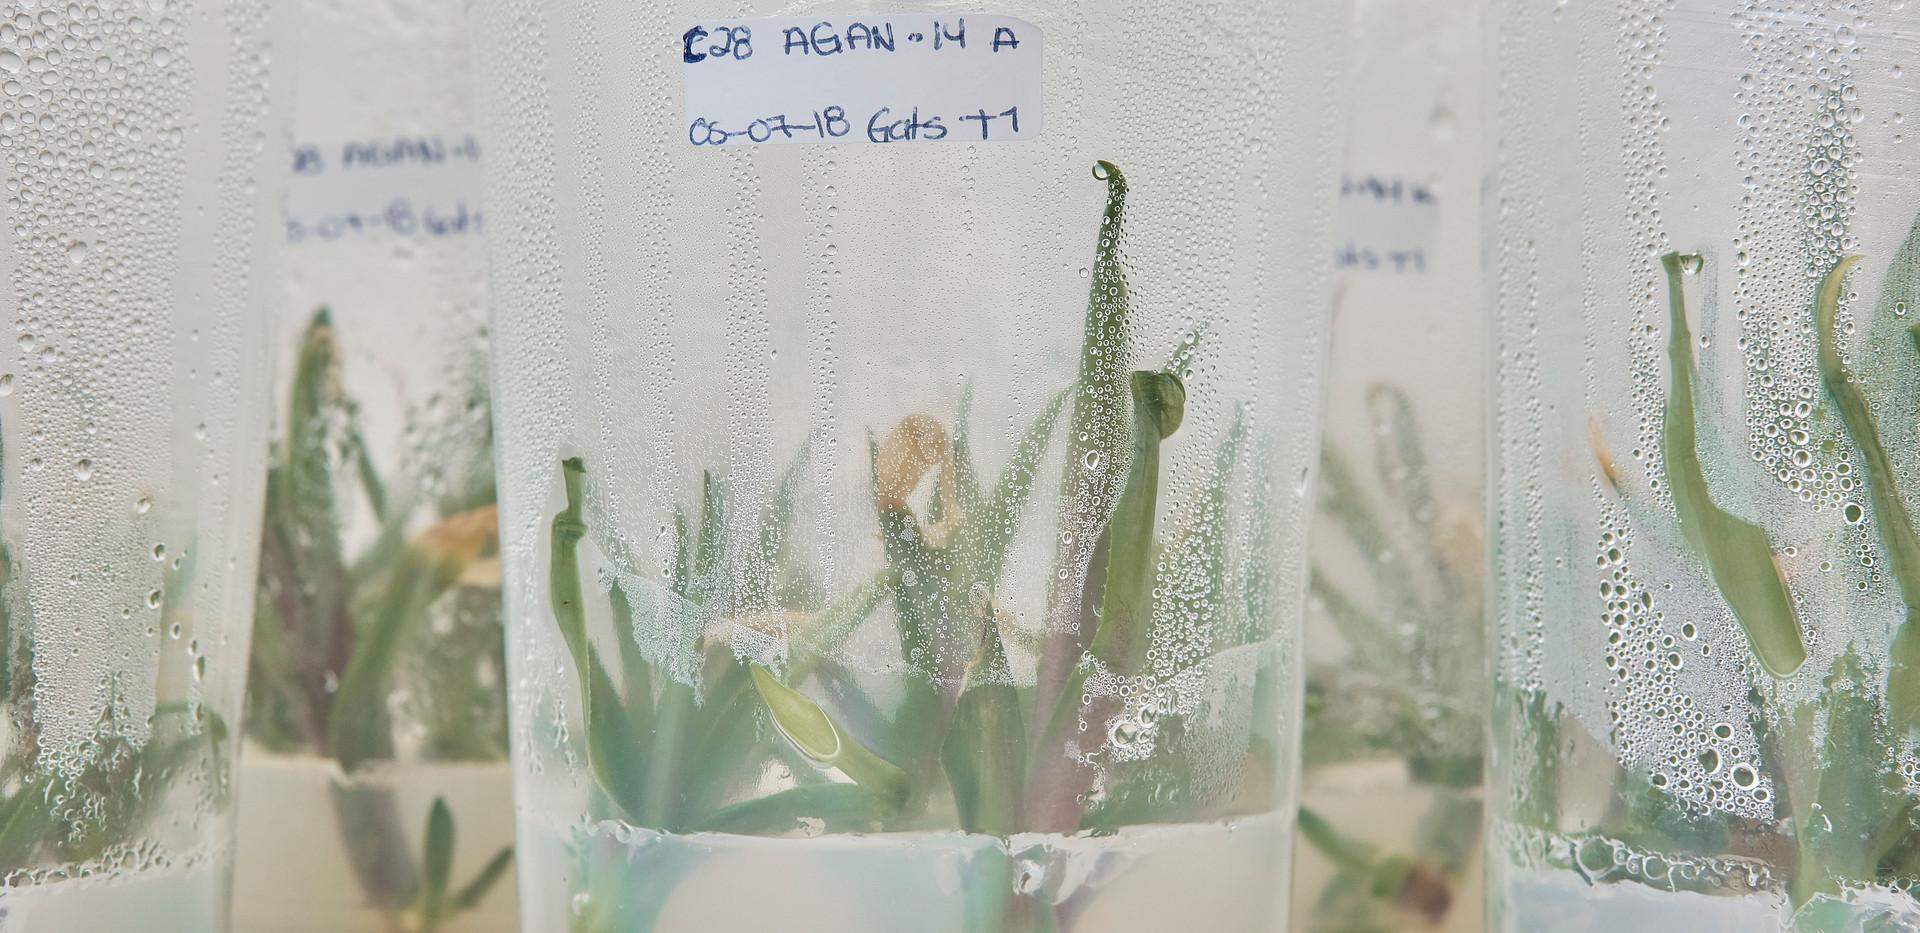 Gogue Biotech Lab Agosto 2018 (6).jpg